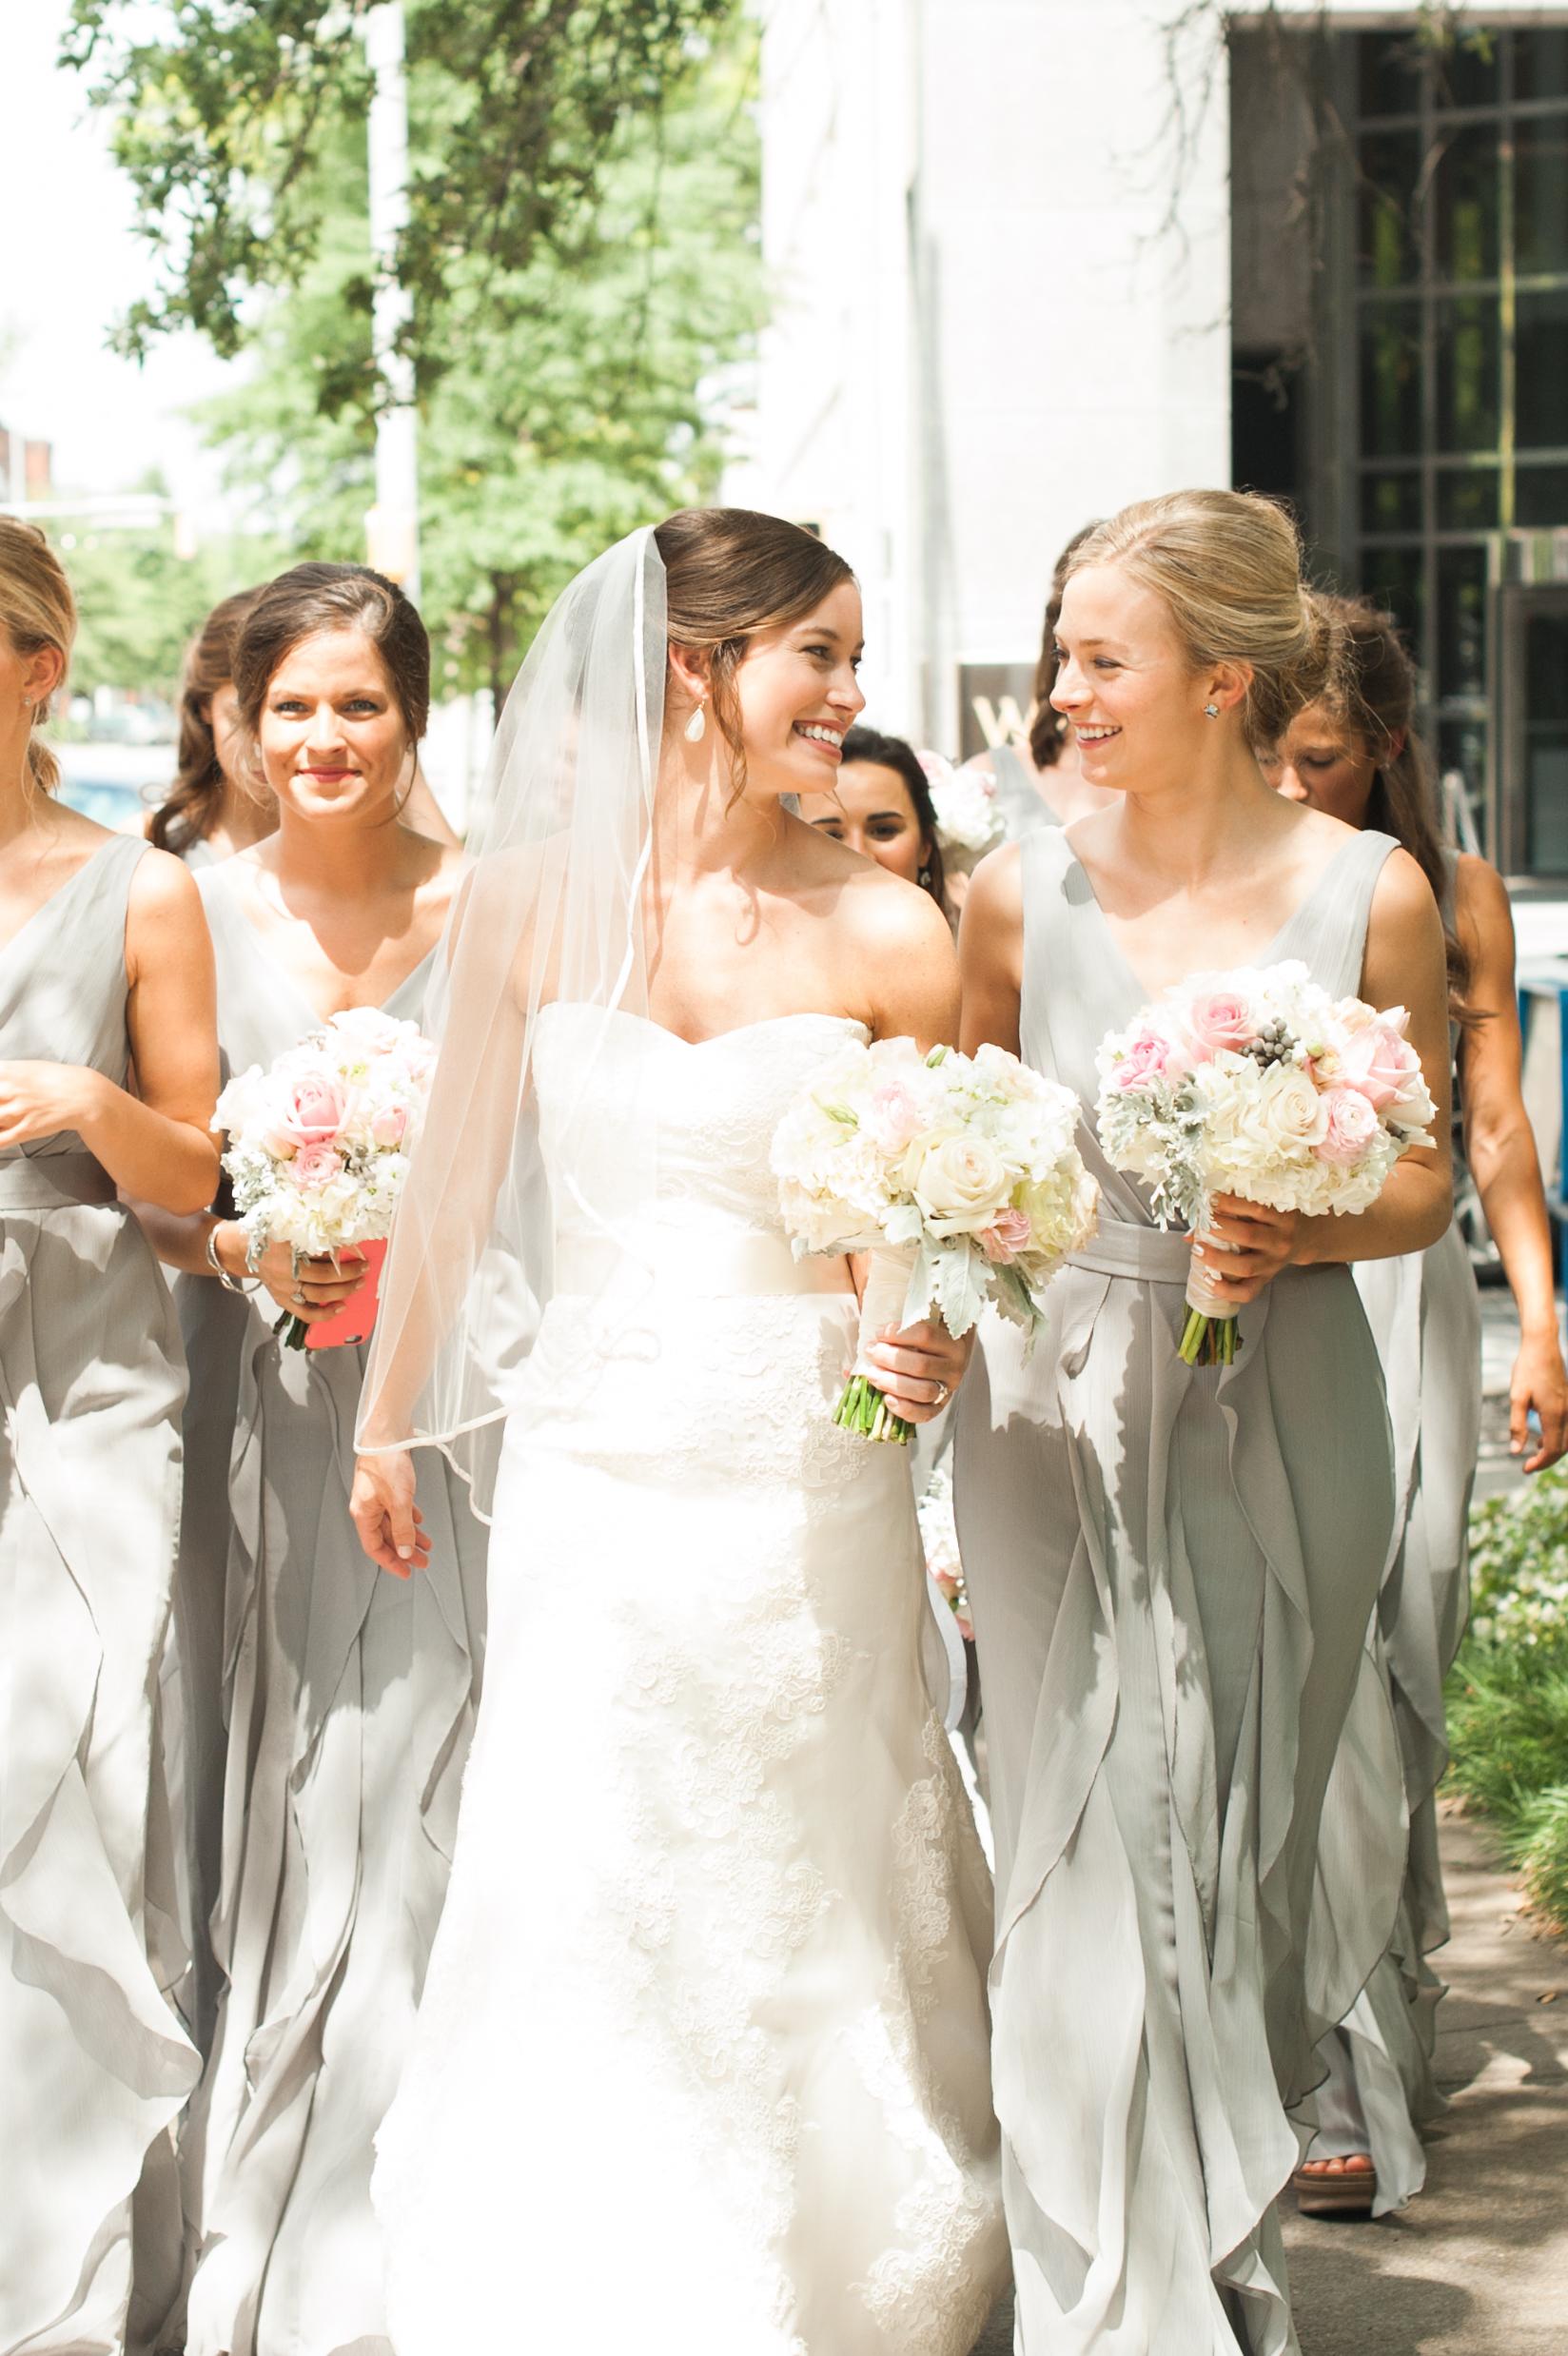 097-Kathleen-Spencer-WeddingParty.jpg